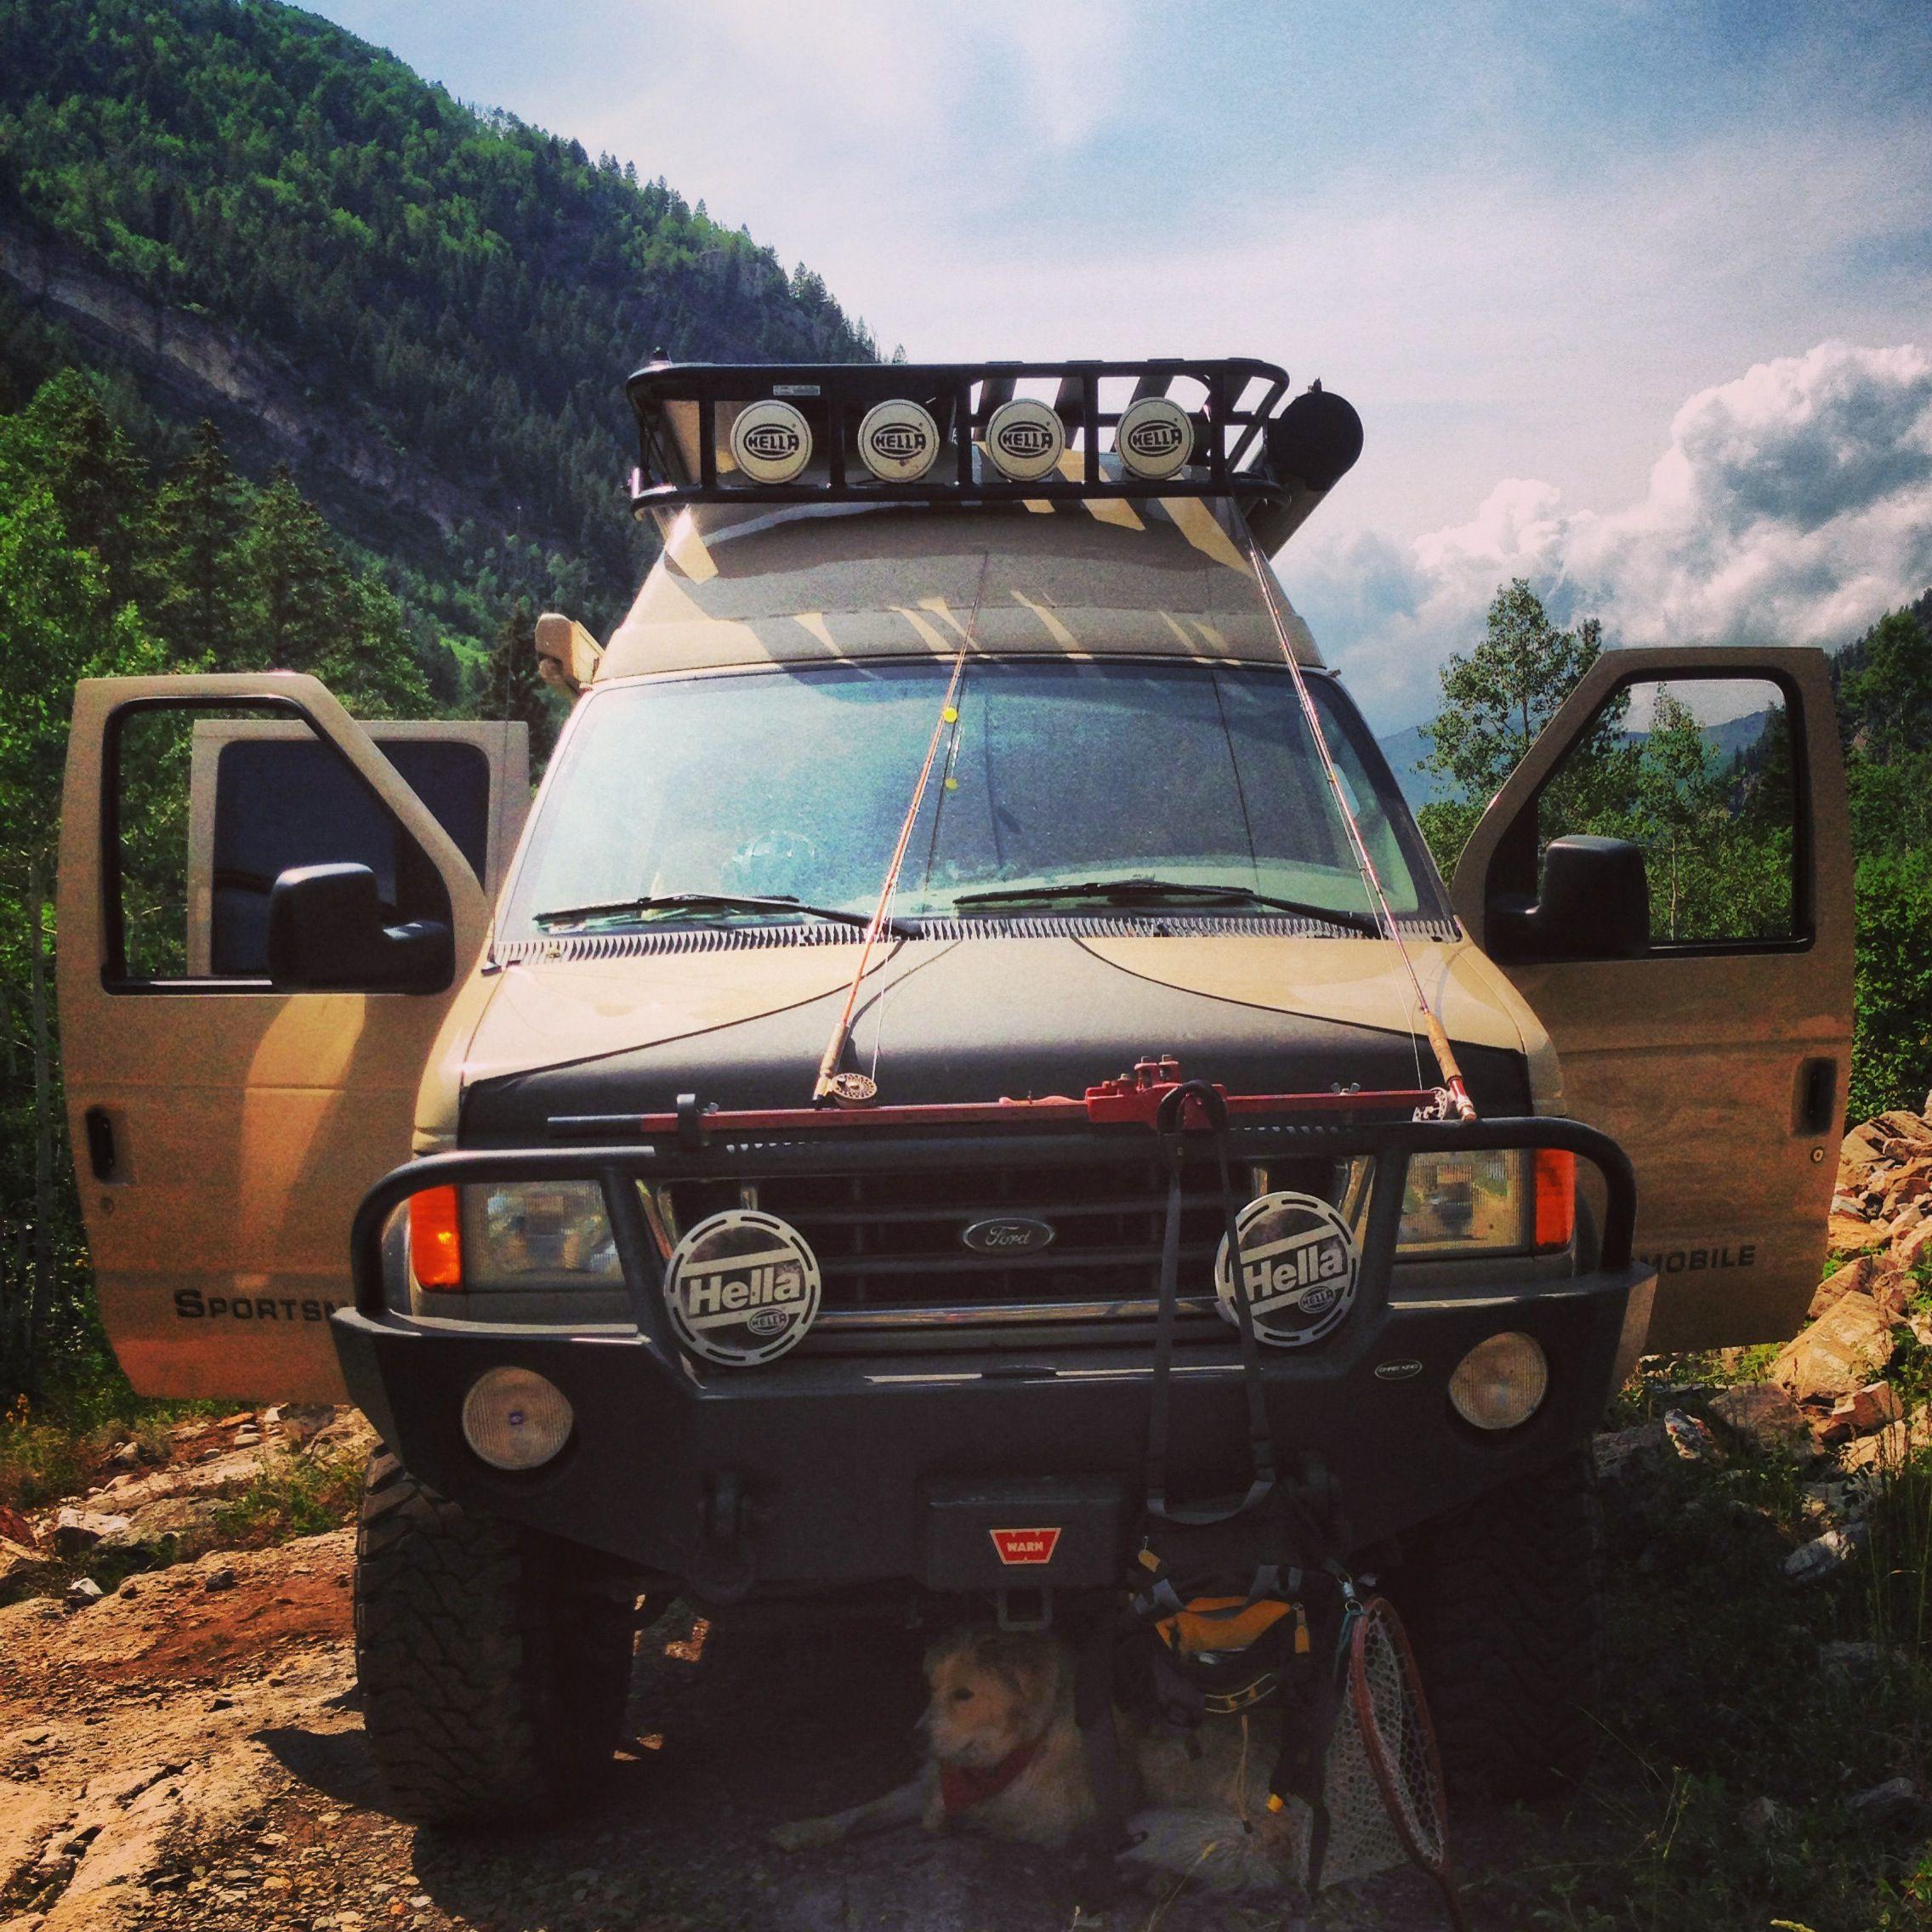 The Sportsmobile Is Our Ultimate Flyfishing Getaway Vehicle Aluminess Front Bumper And Roof Rack 4x4 Van Sportsmobile Van